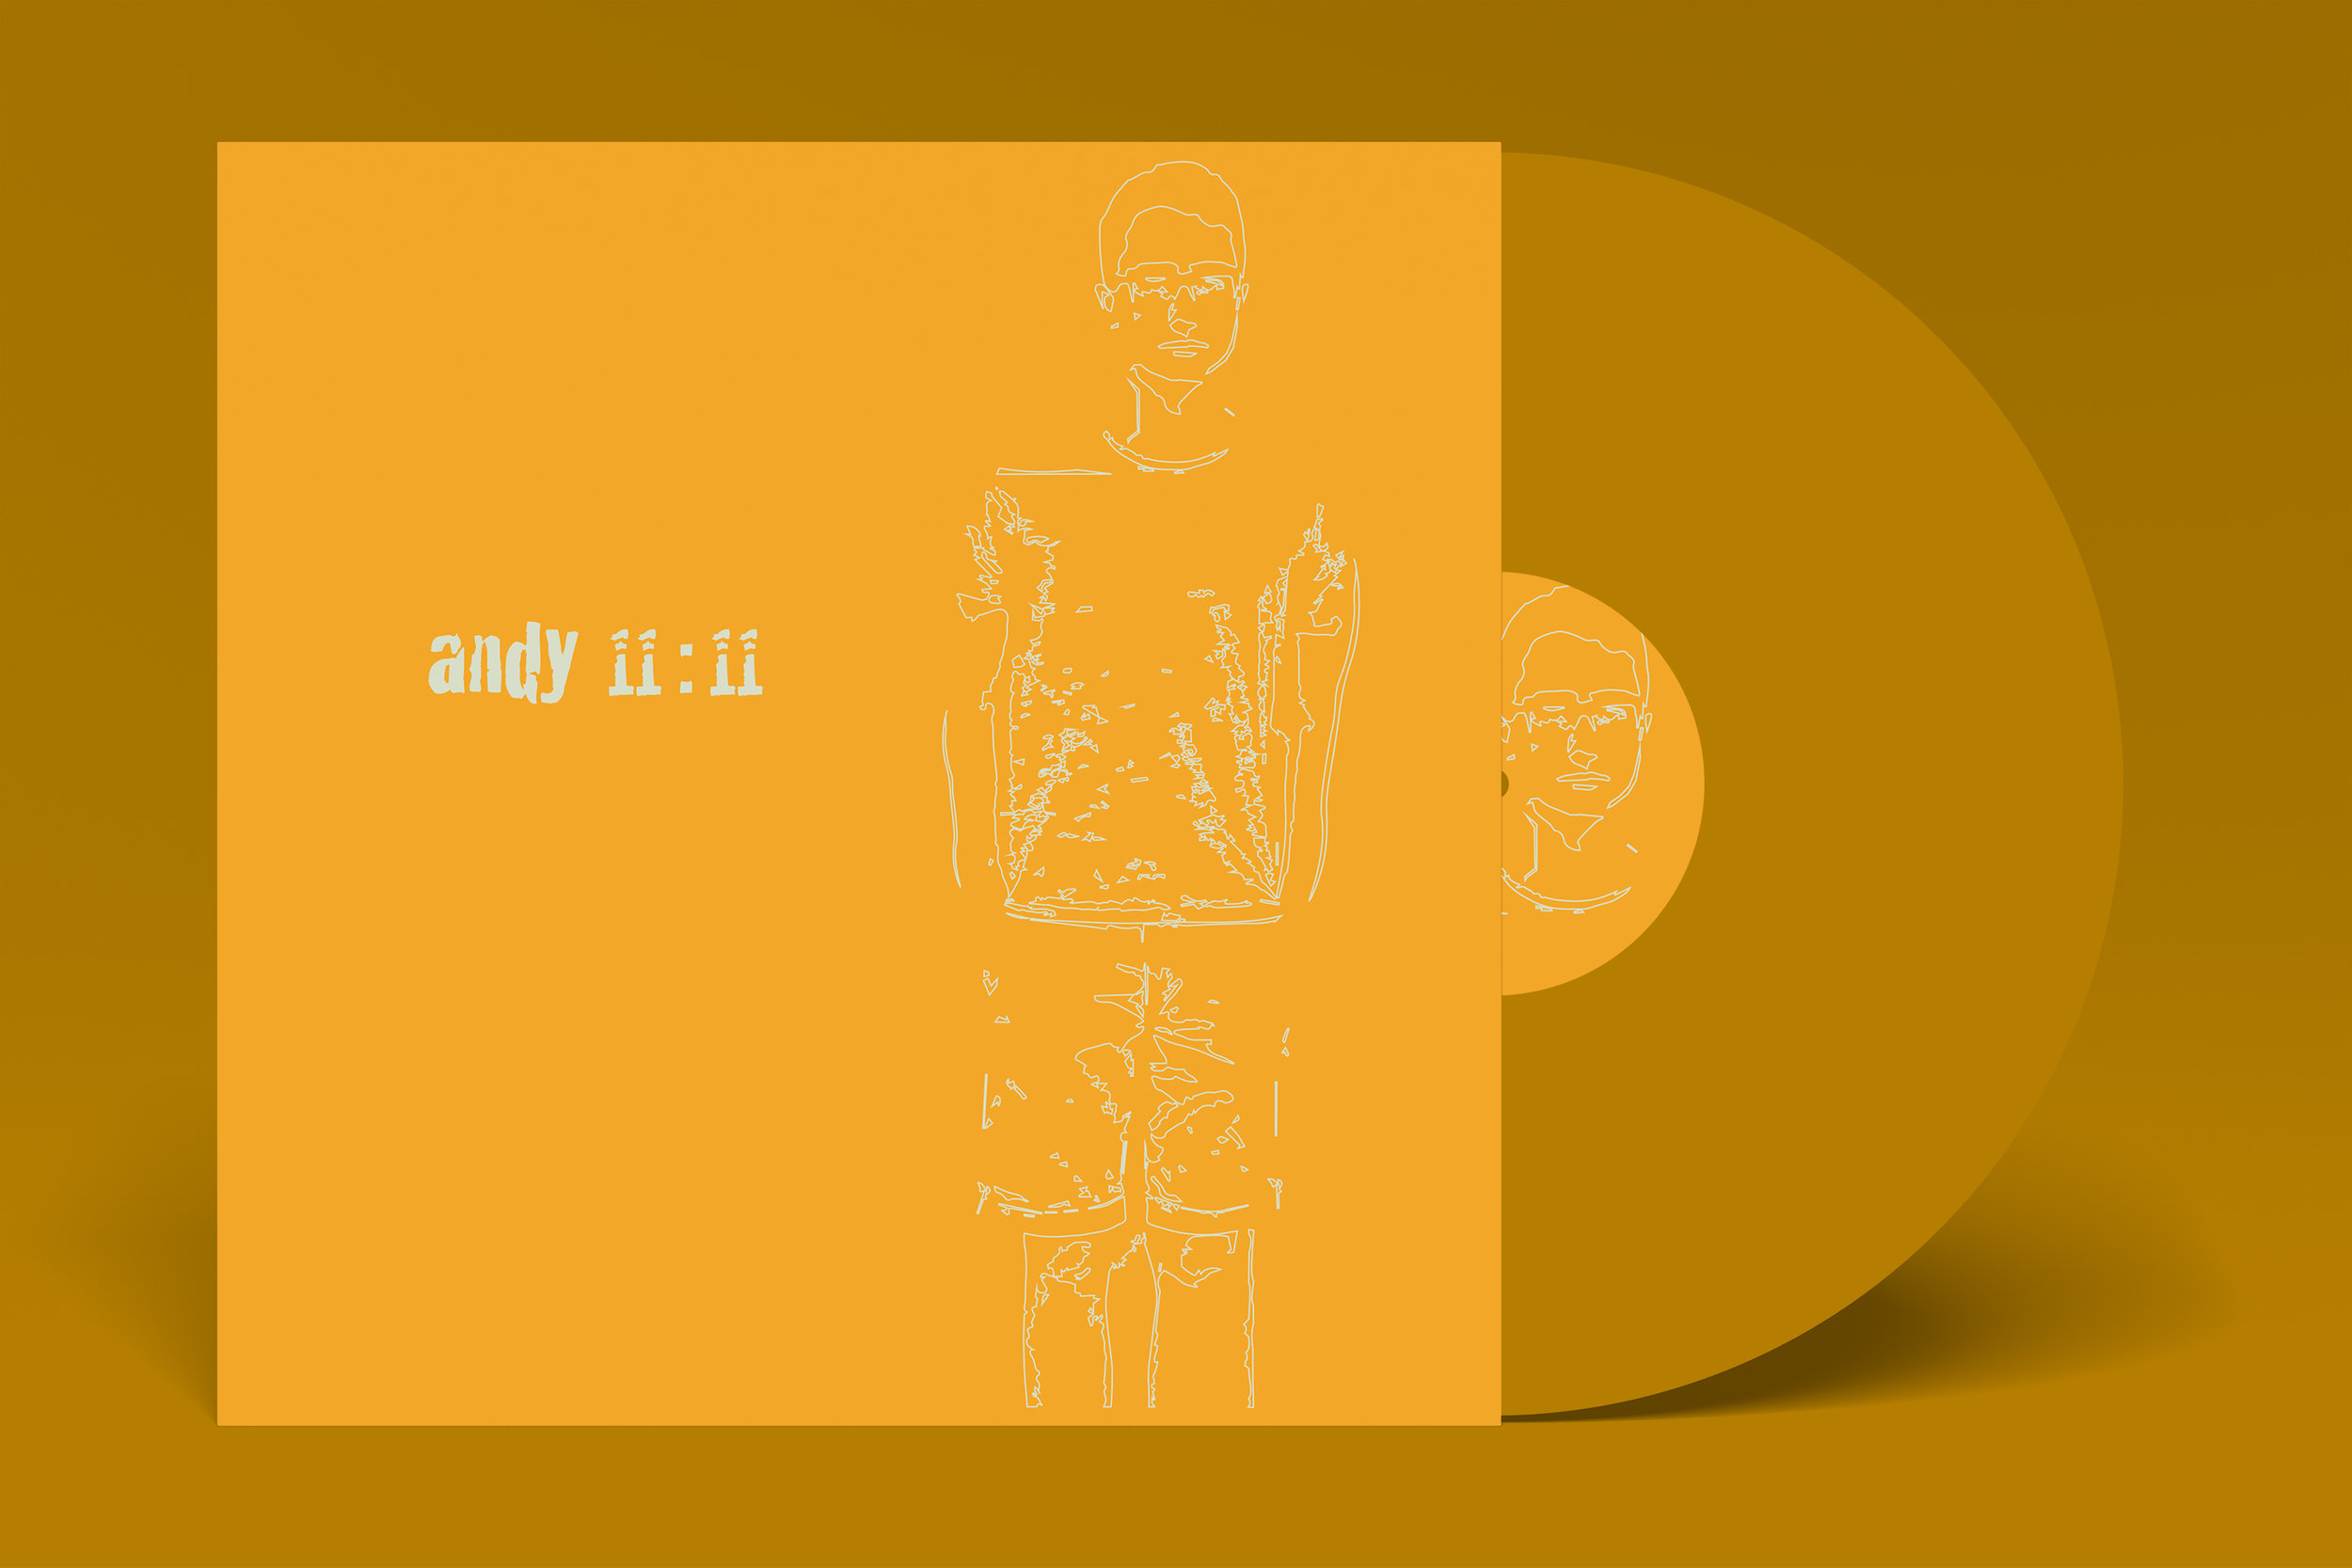 album_cover_5_front.jpg